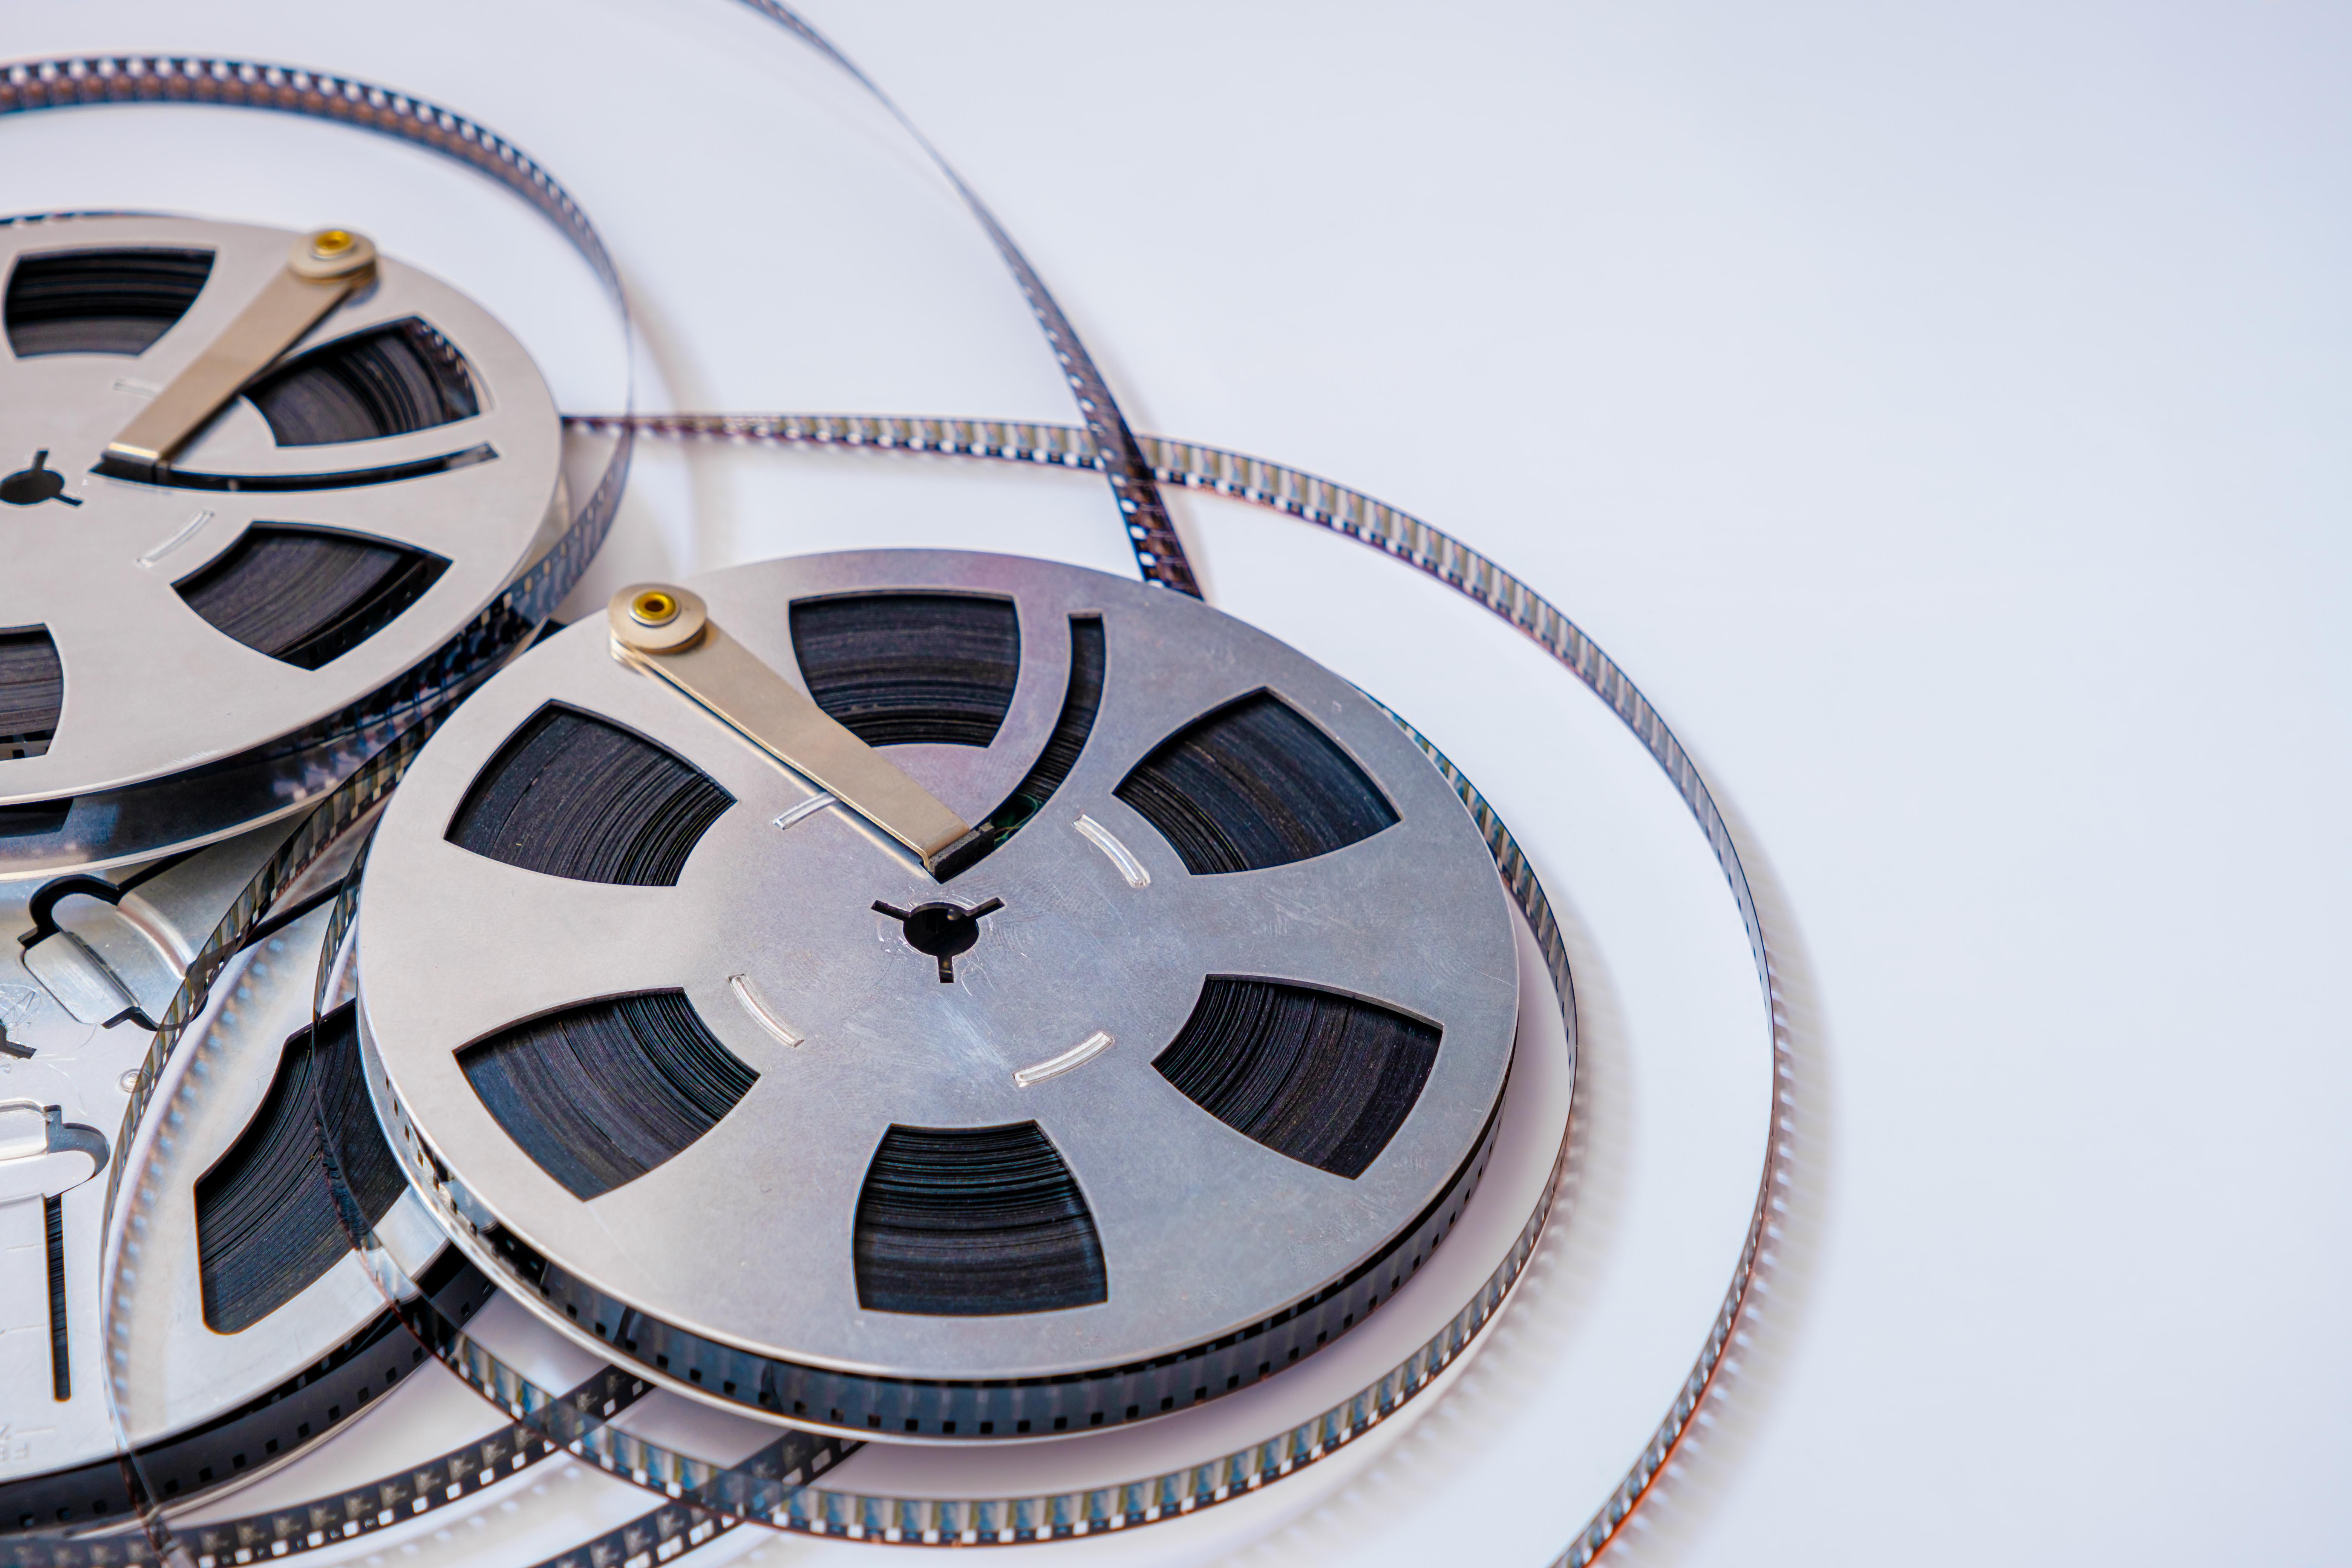 equipment for video studio